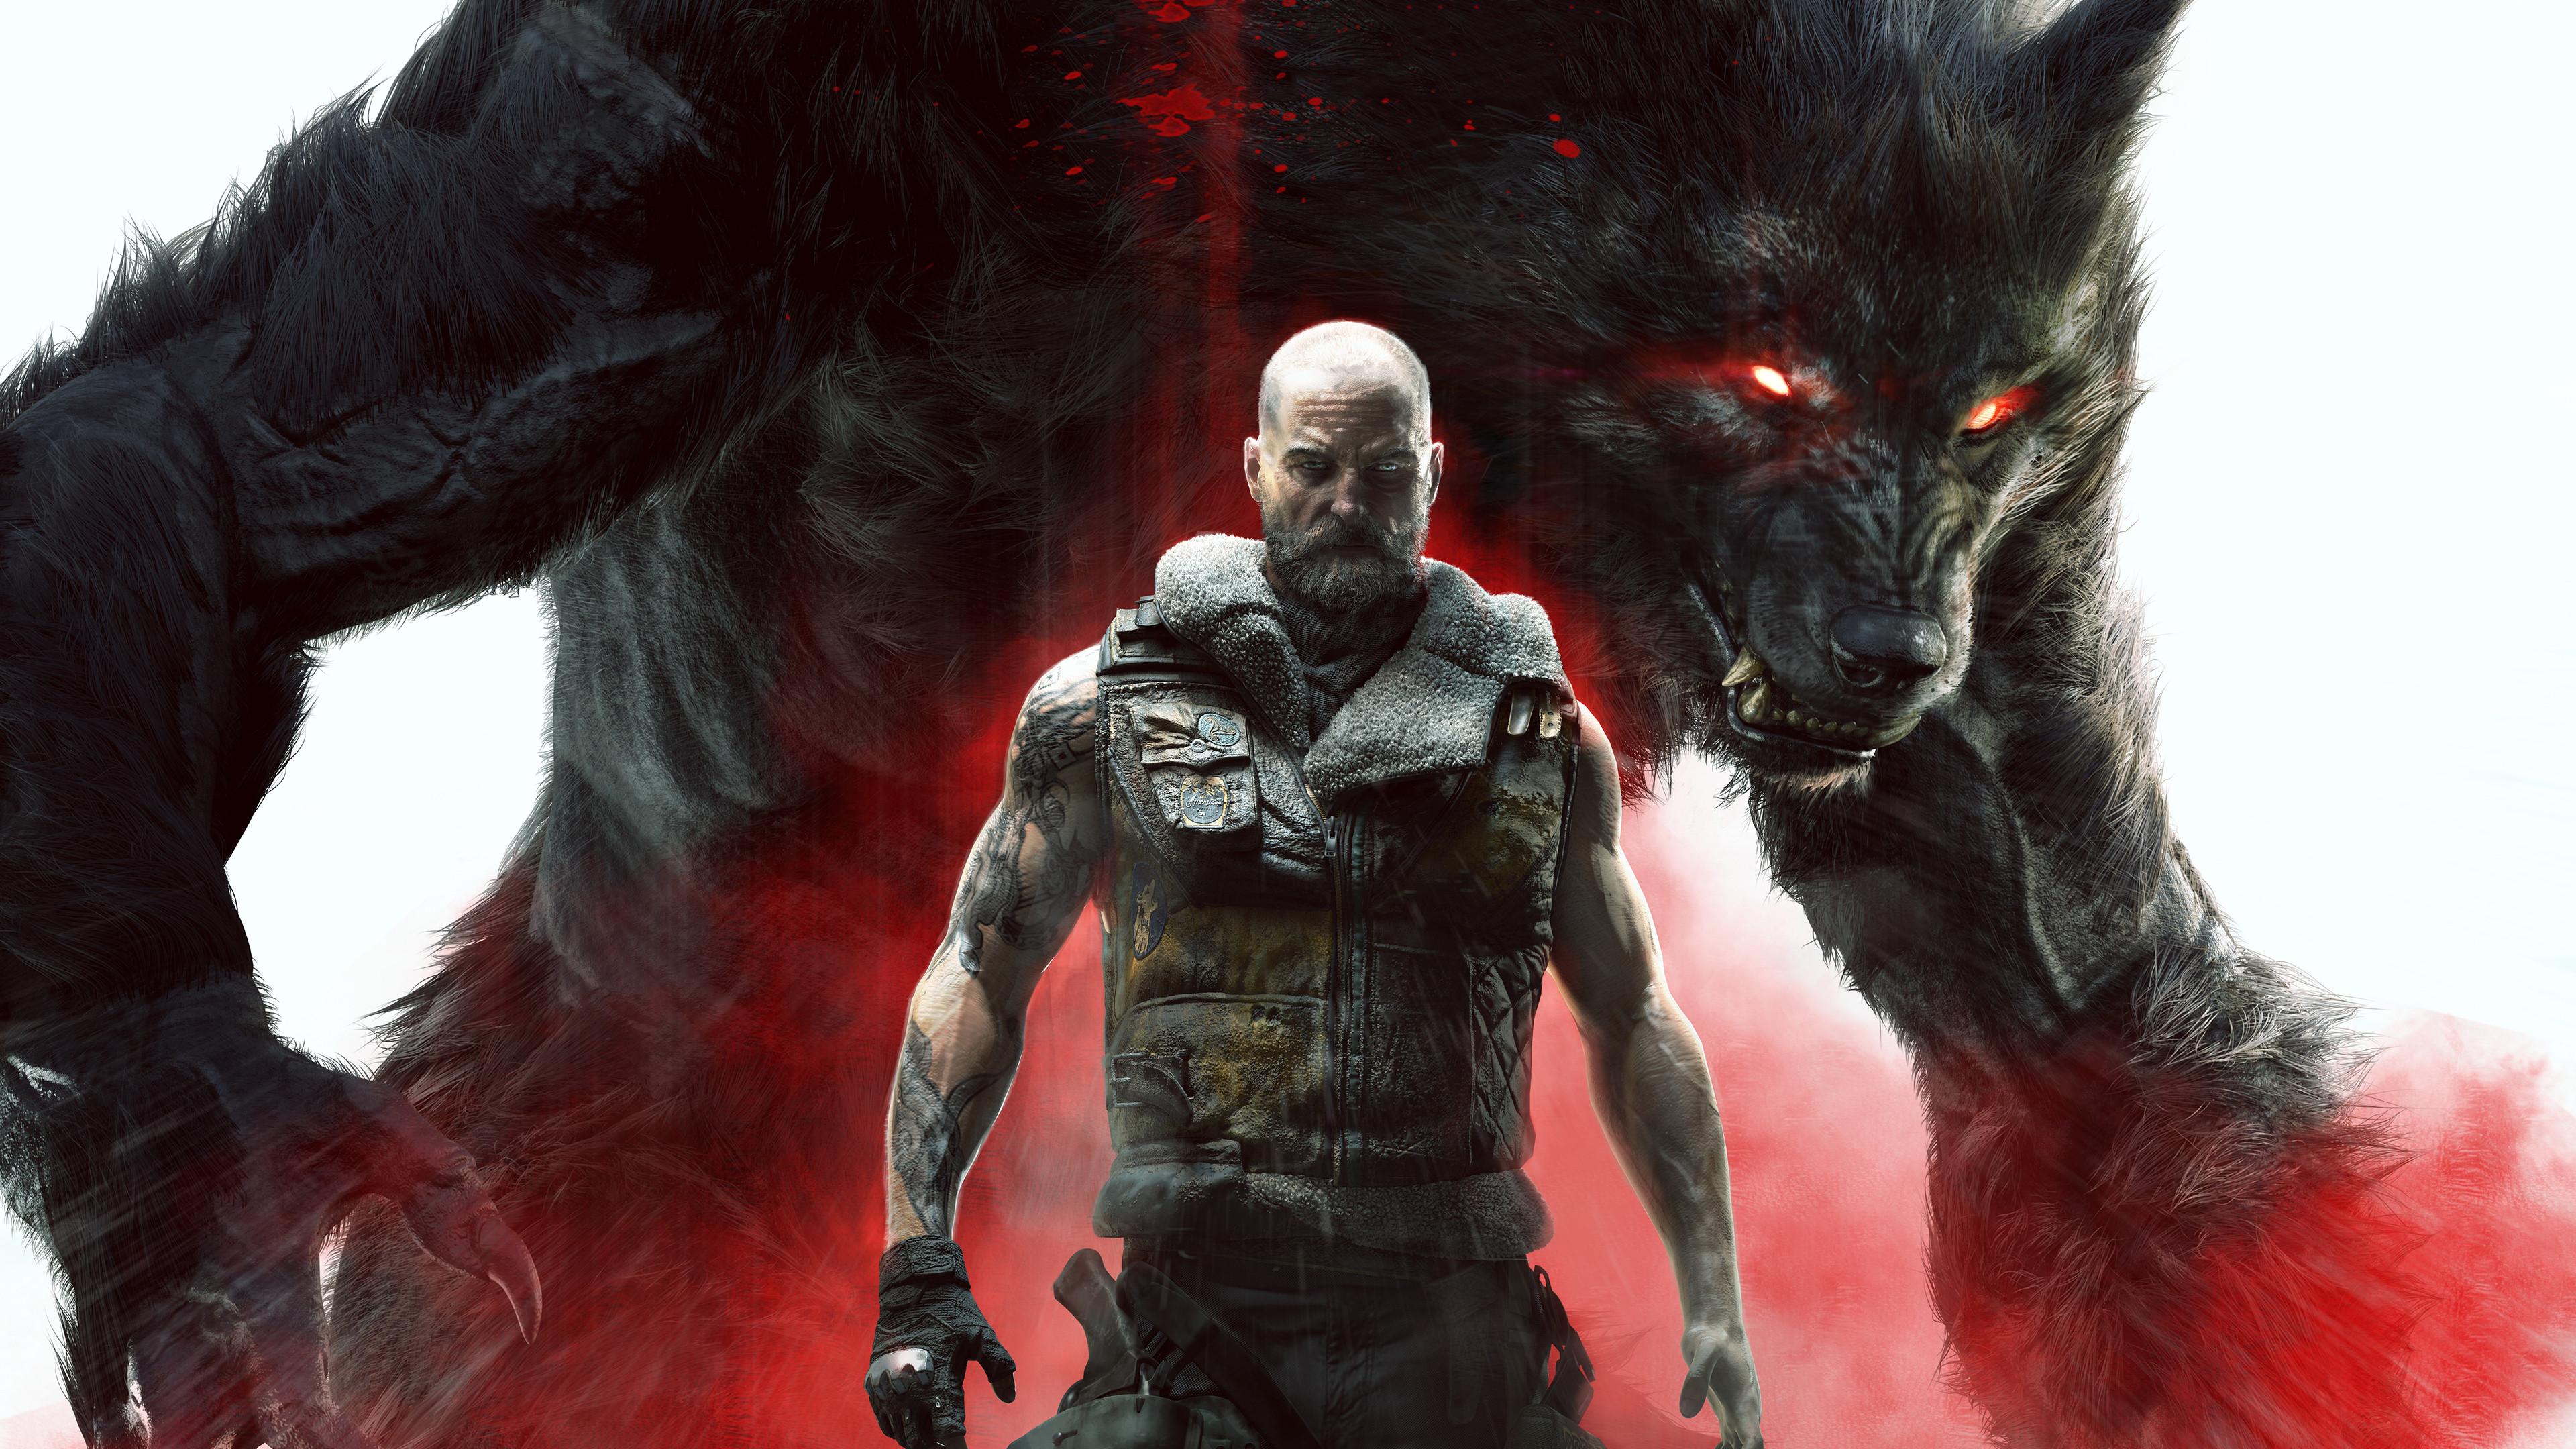 werewolf the apocalypse earthblood 2020 4k su 3840x2160 1 - The Apocalypse Earthblood :Werewolf 2020 - The Apocalypse Earthblood :Werewolf 4k wallpaper